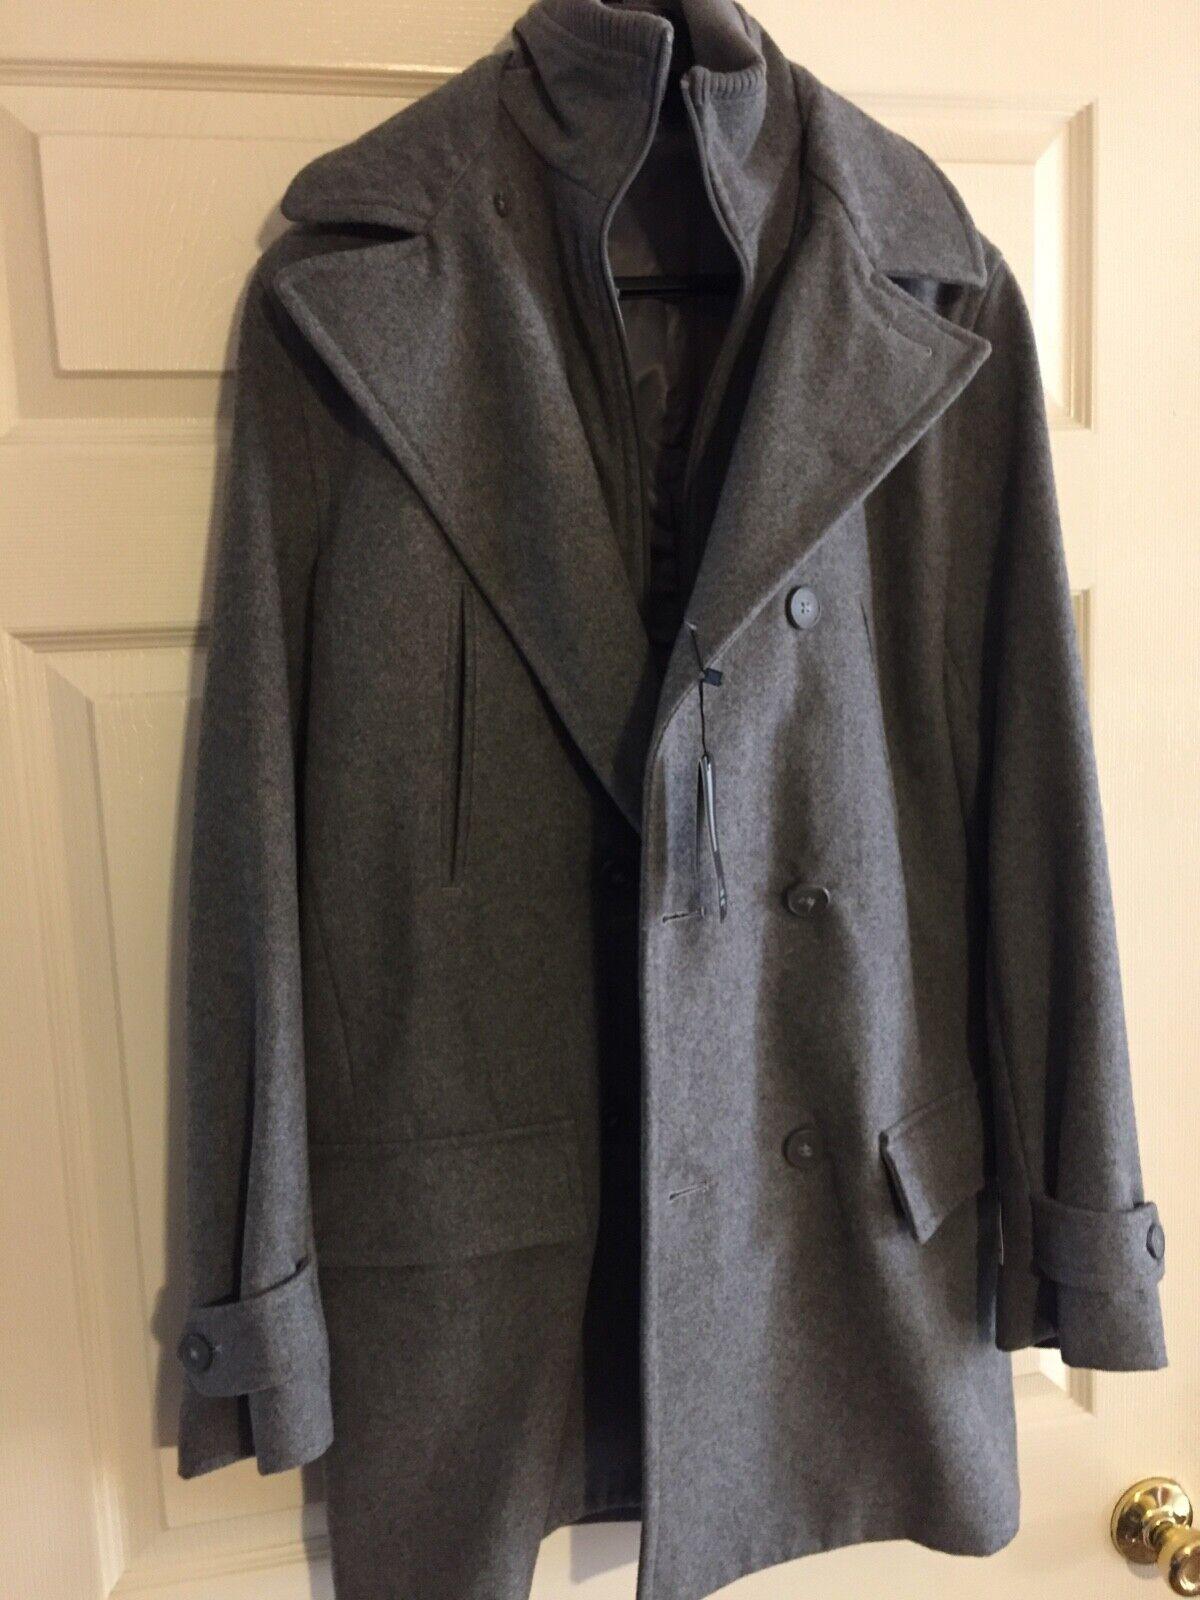 JF Designer Coat Men Size S (fits medium)